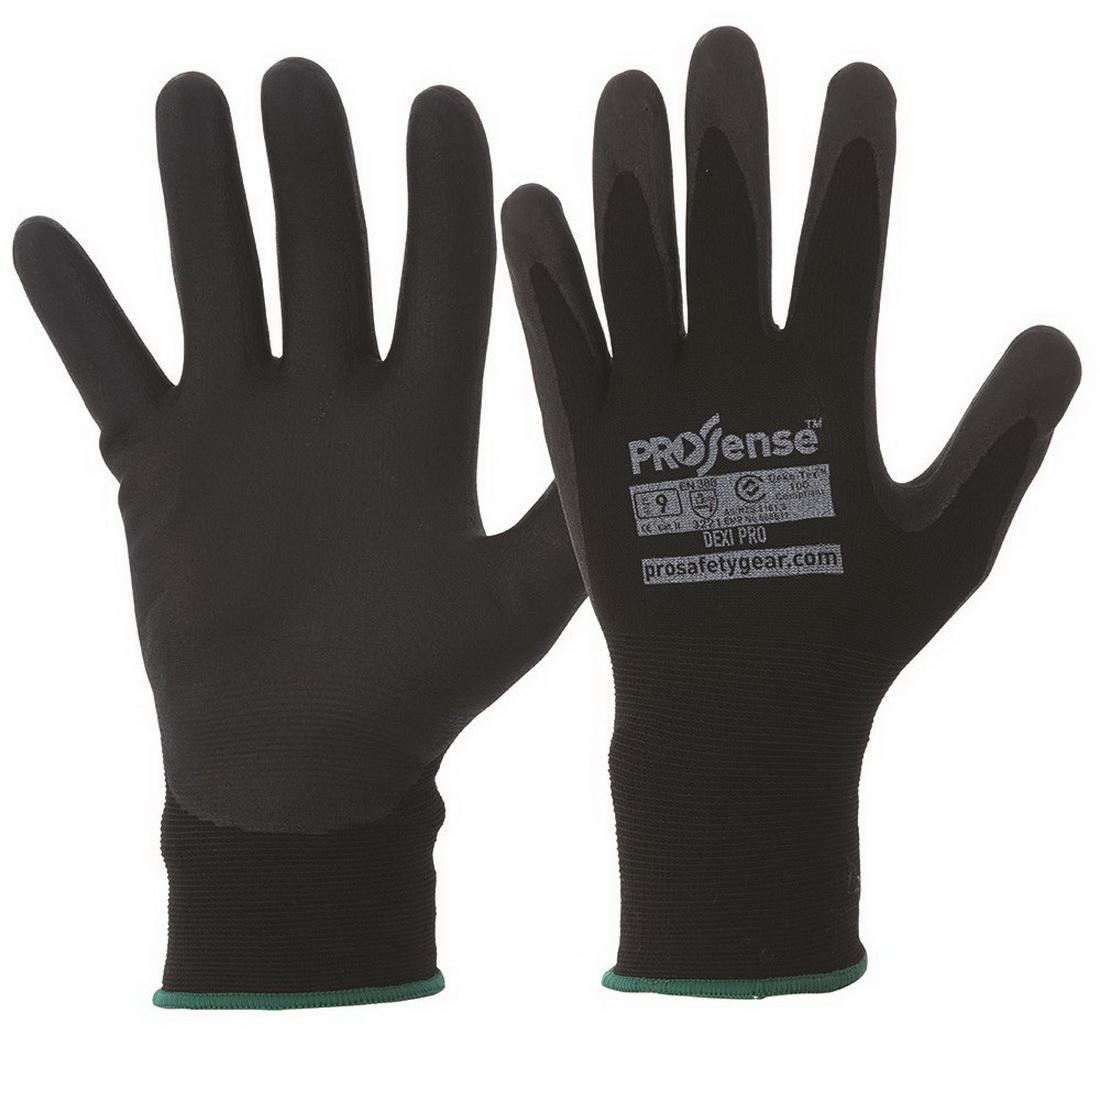 Prosense Synthetic Dipped Range Dexi-Pro Gloves Black